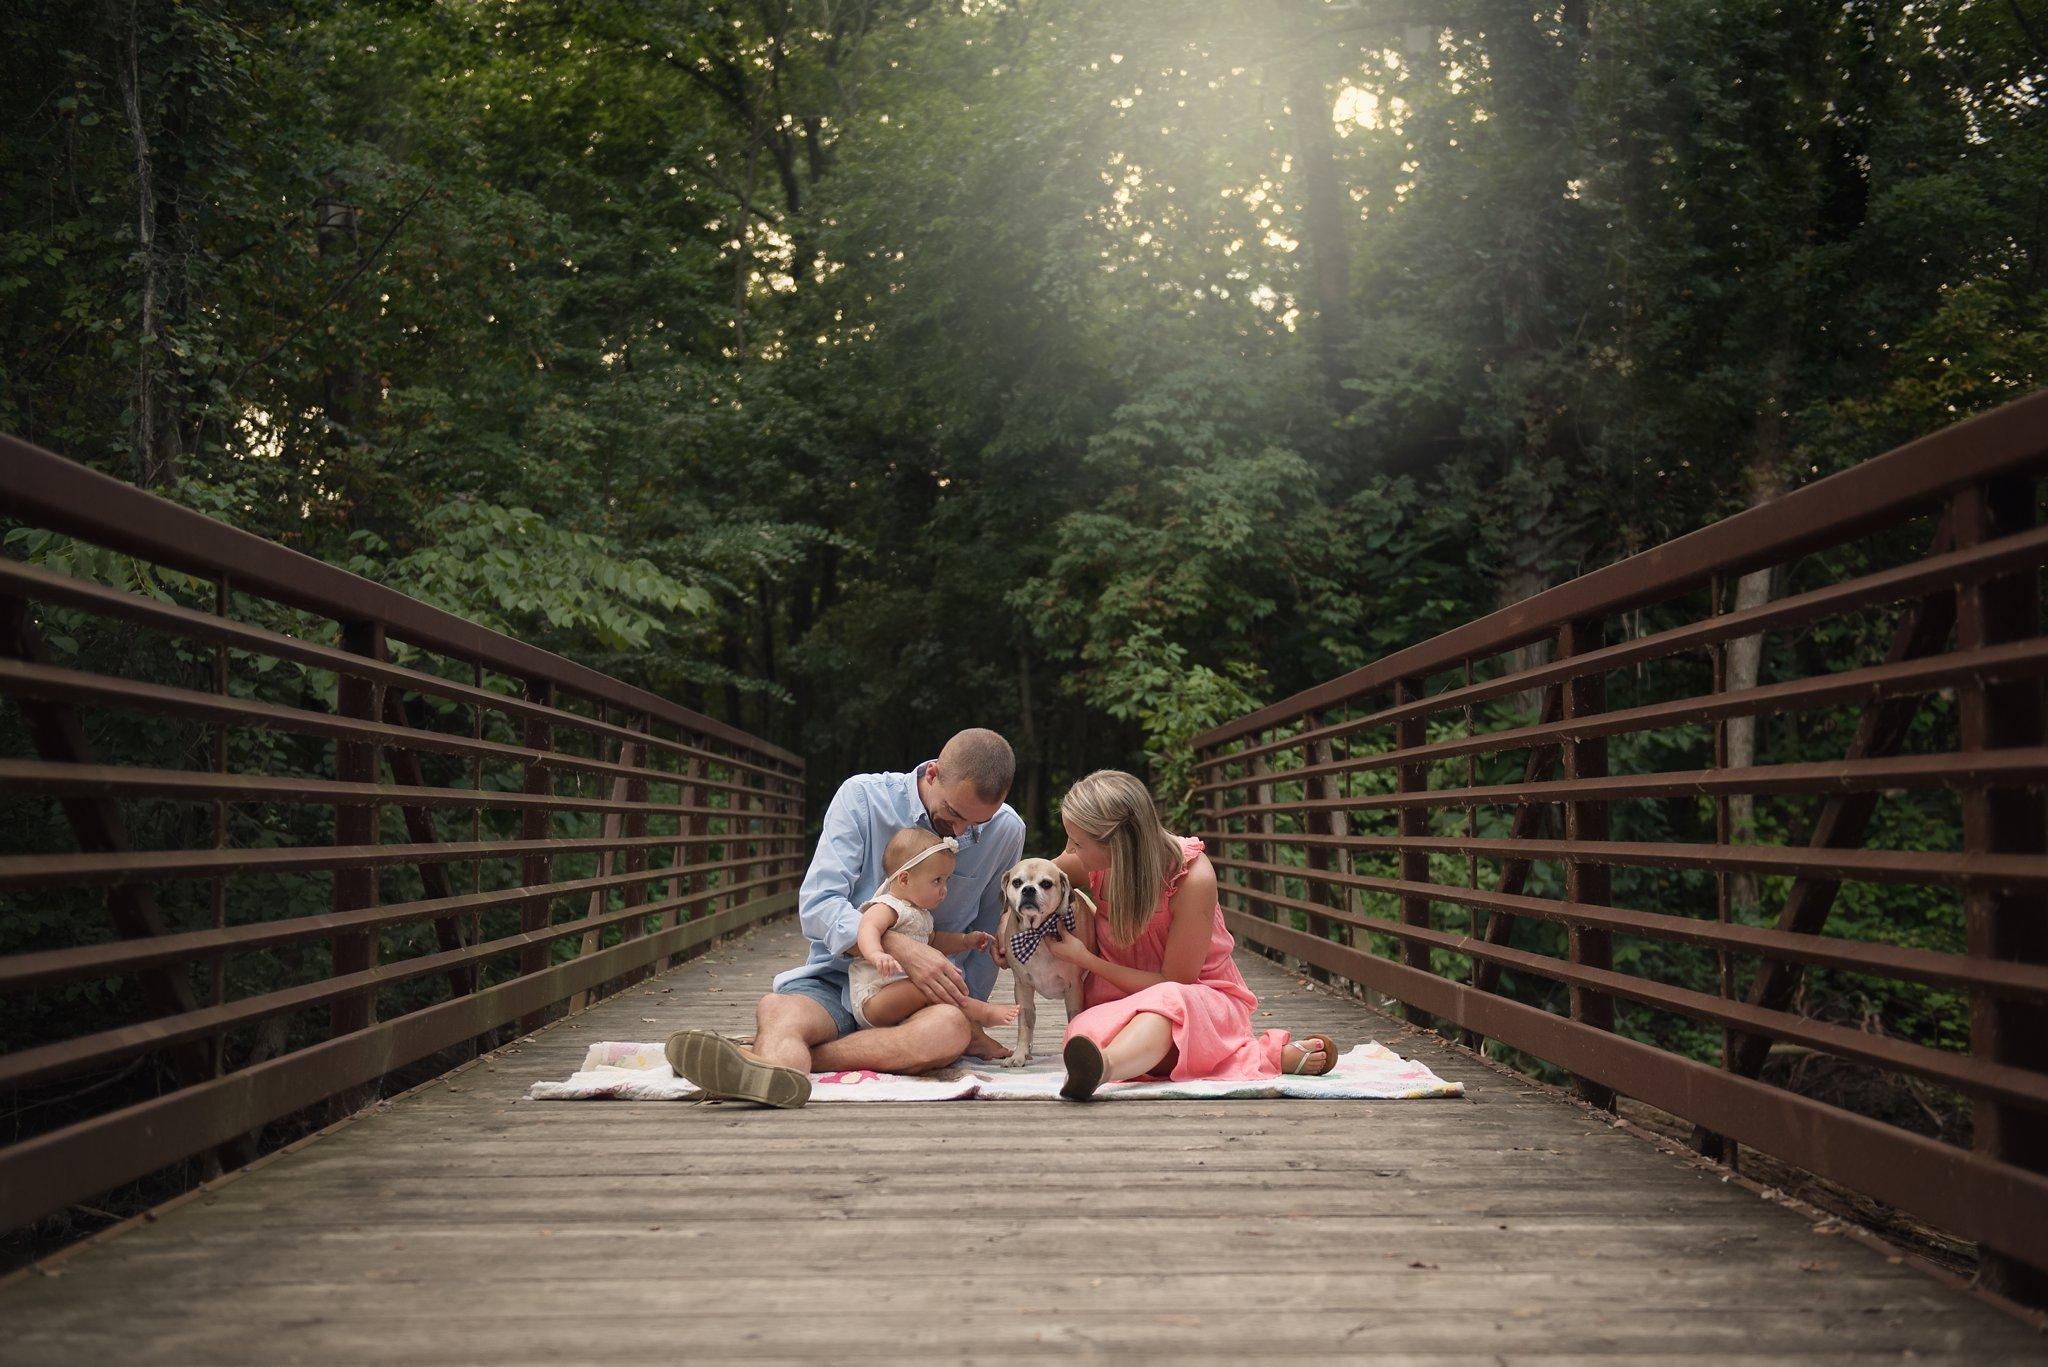 columbusohiofamilyphotographer-jacquelinemariephotography_0015.jpg